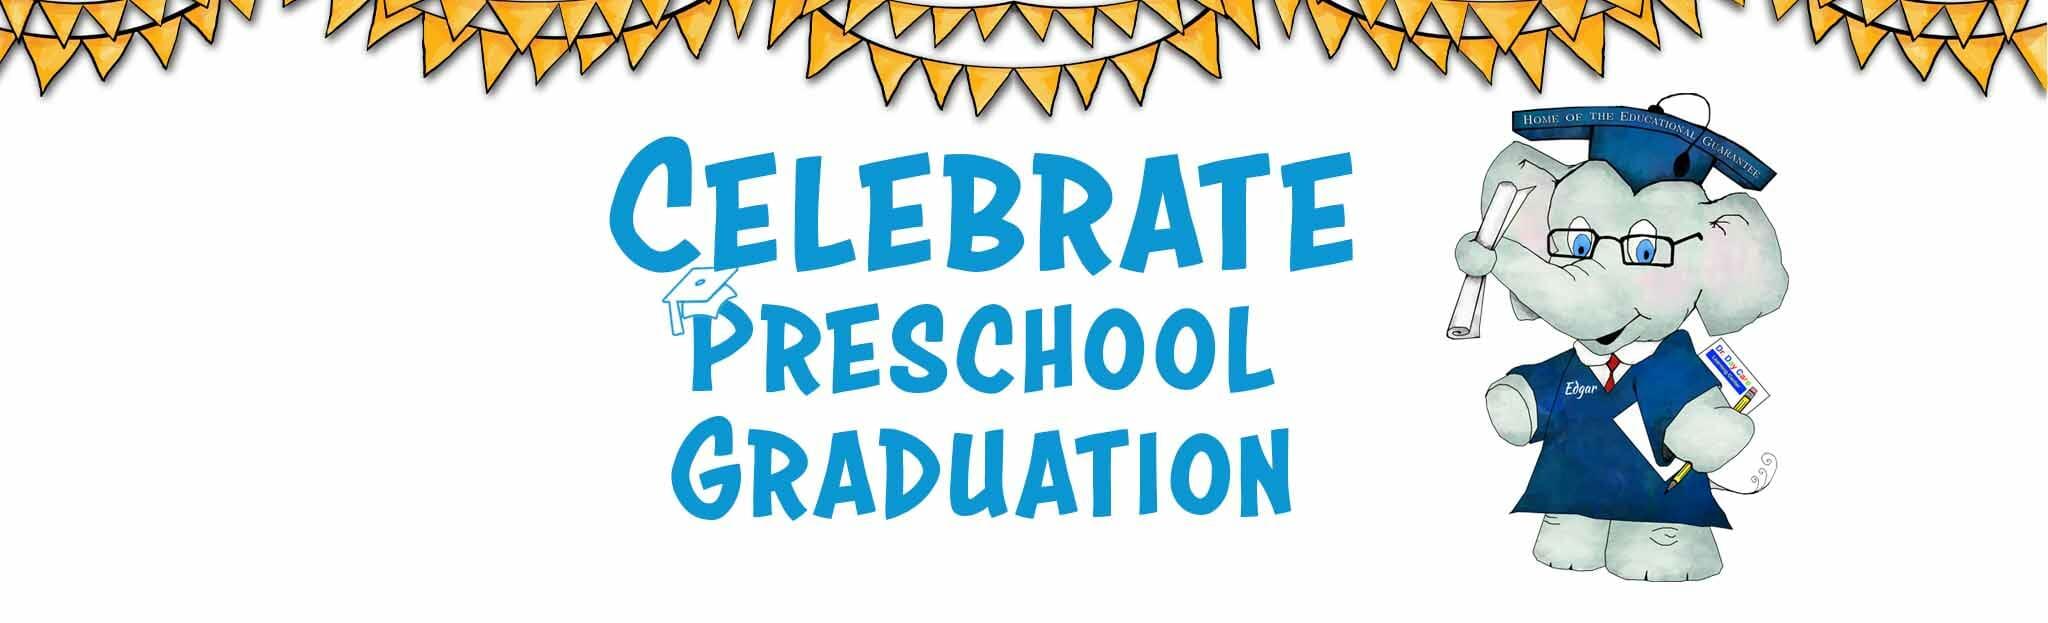 Teach the importance of a preschool graduation